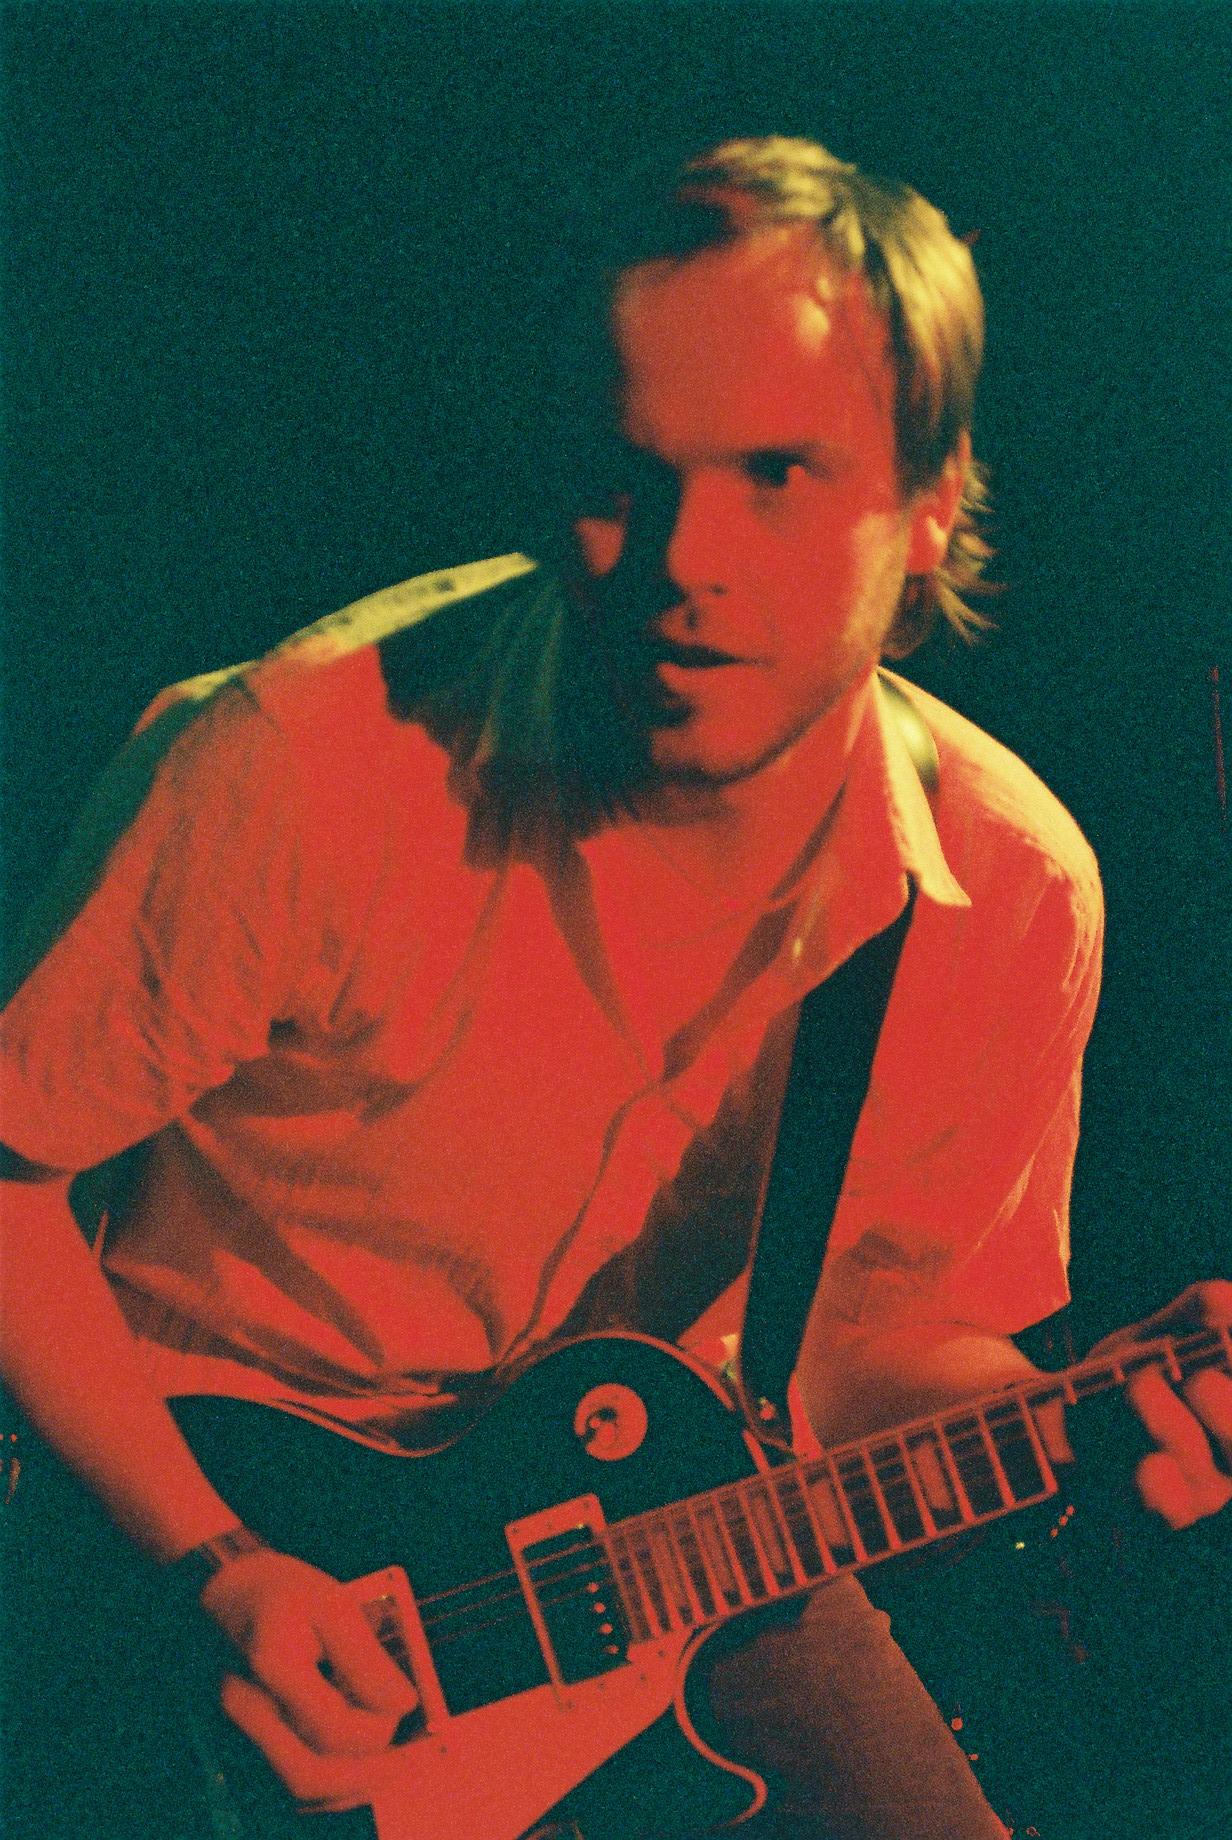 Tarkan Algin - The Dees - Showcase - Union Chapel 2004, Islington